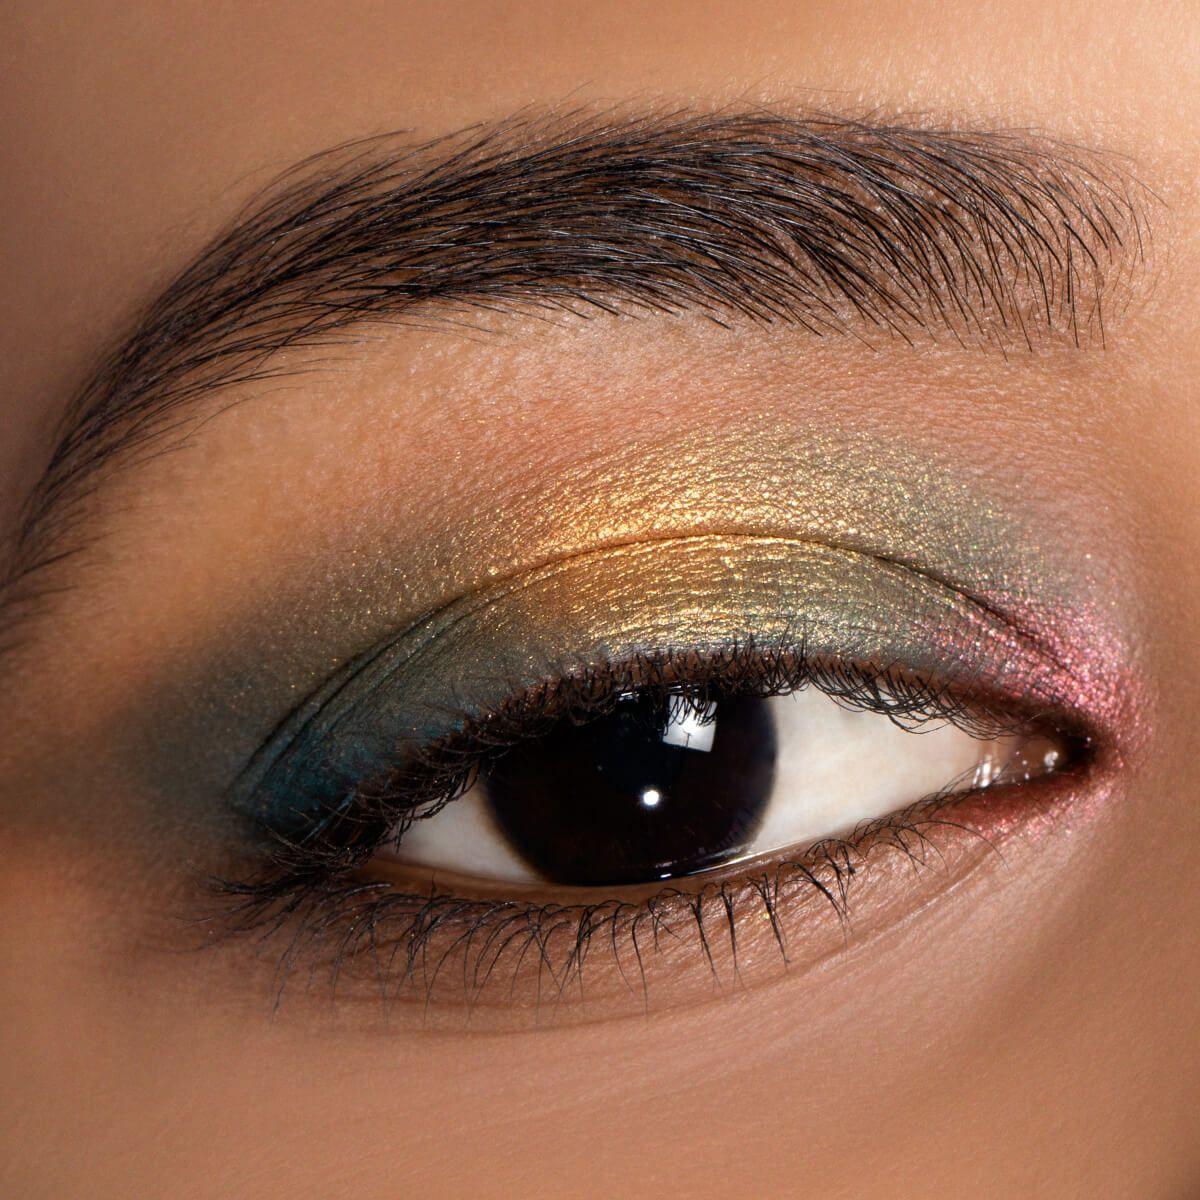 WORLD CUP CRAZE: SRI LANKA Eye Makeup